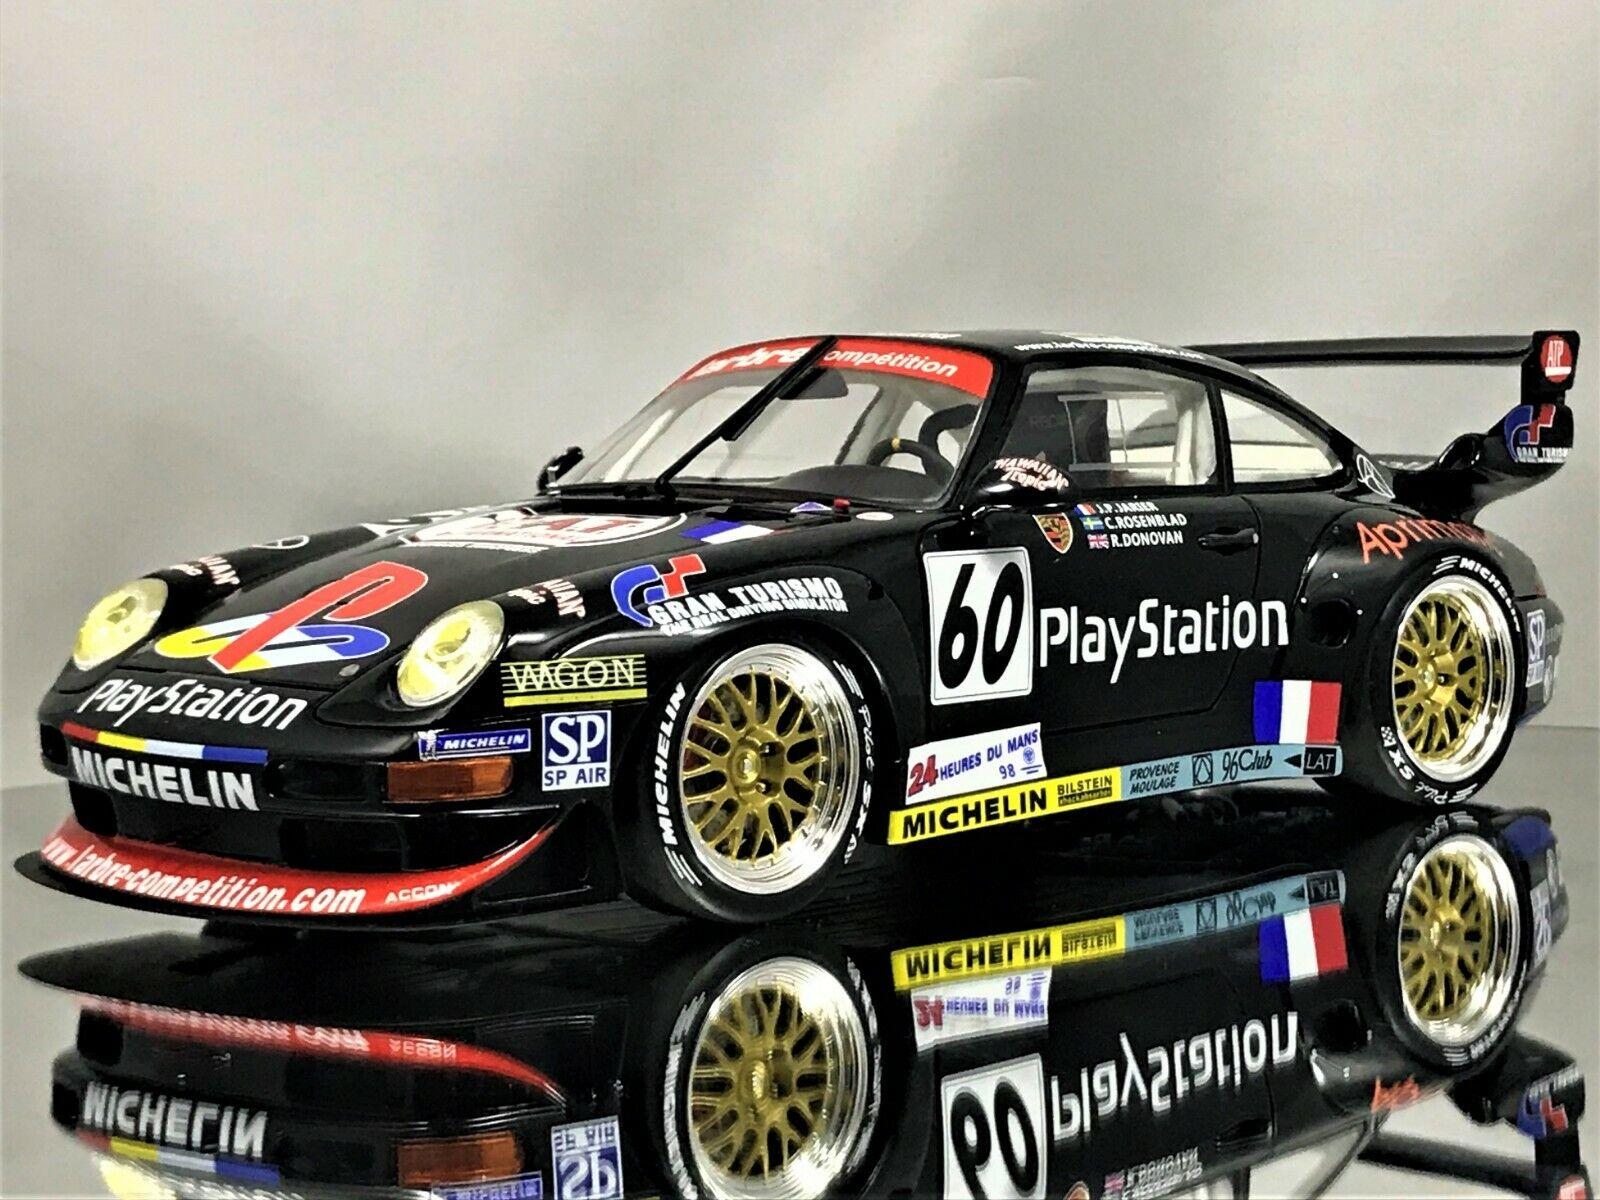 GT anda Porsche 911 (993) GT2 24Hour Le Mans spelaStation Gran Turismo 1 18